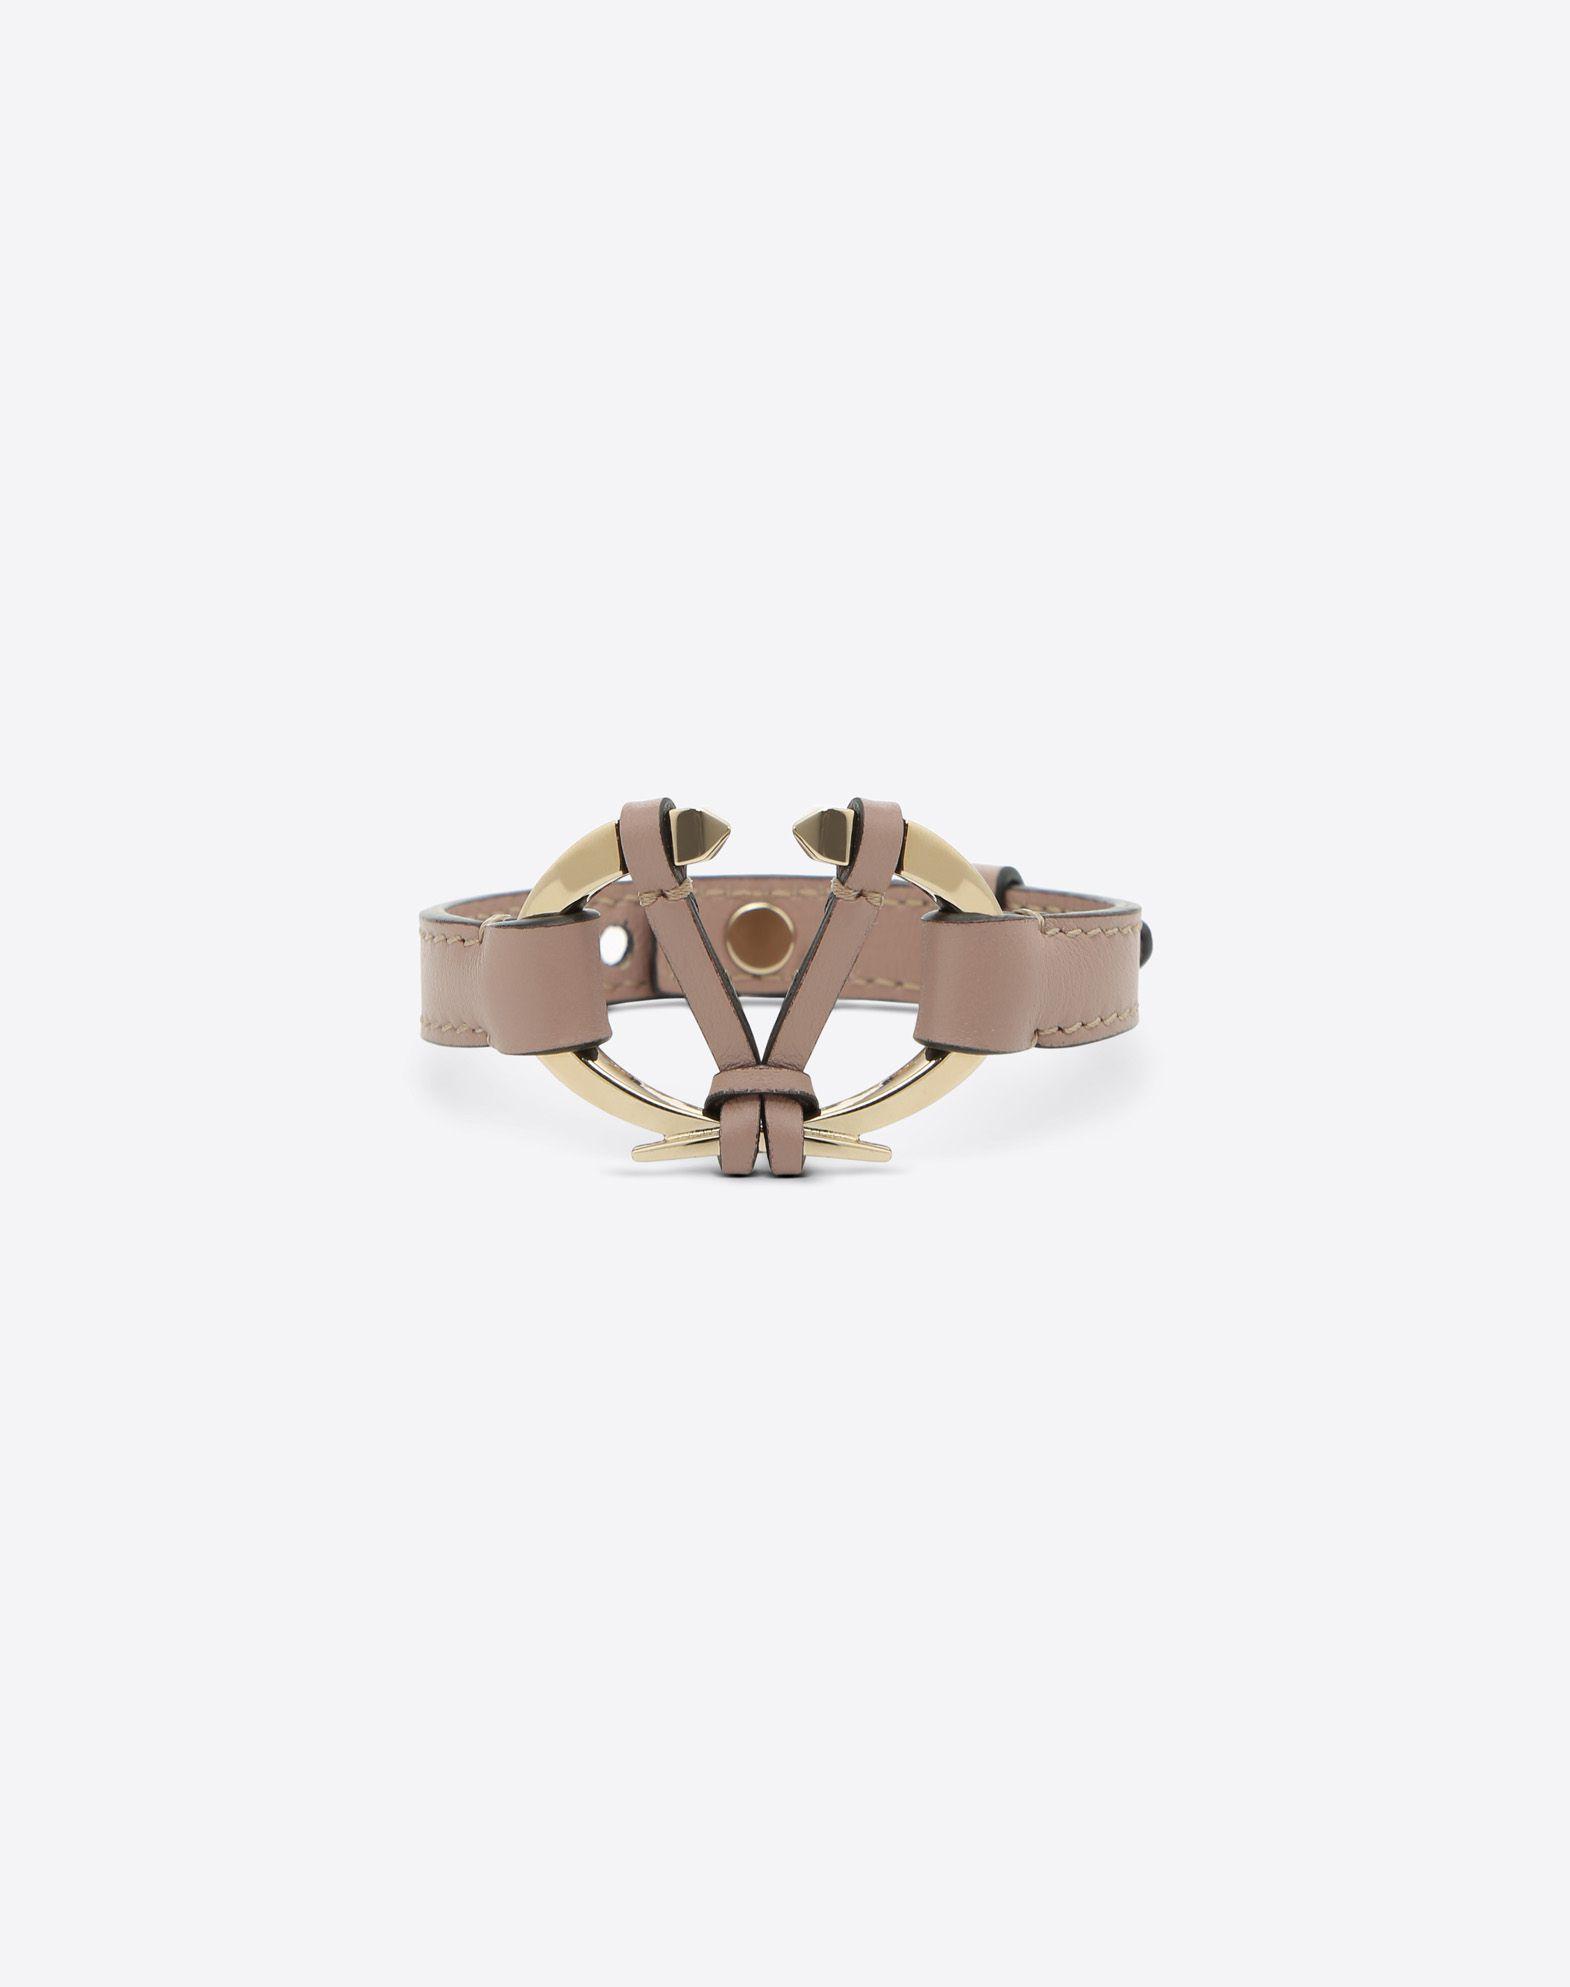 VALENTINO Logo application Strap material: leather  50205340bu